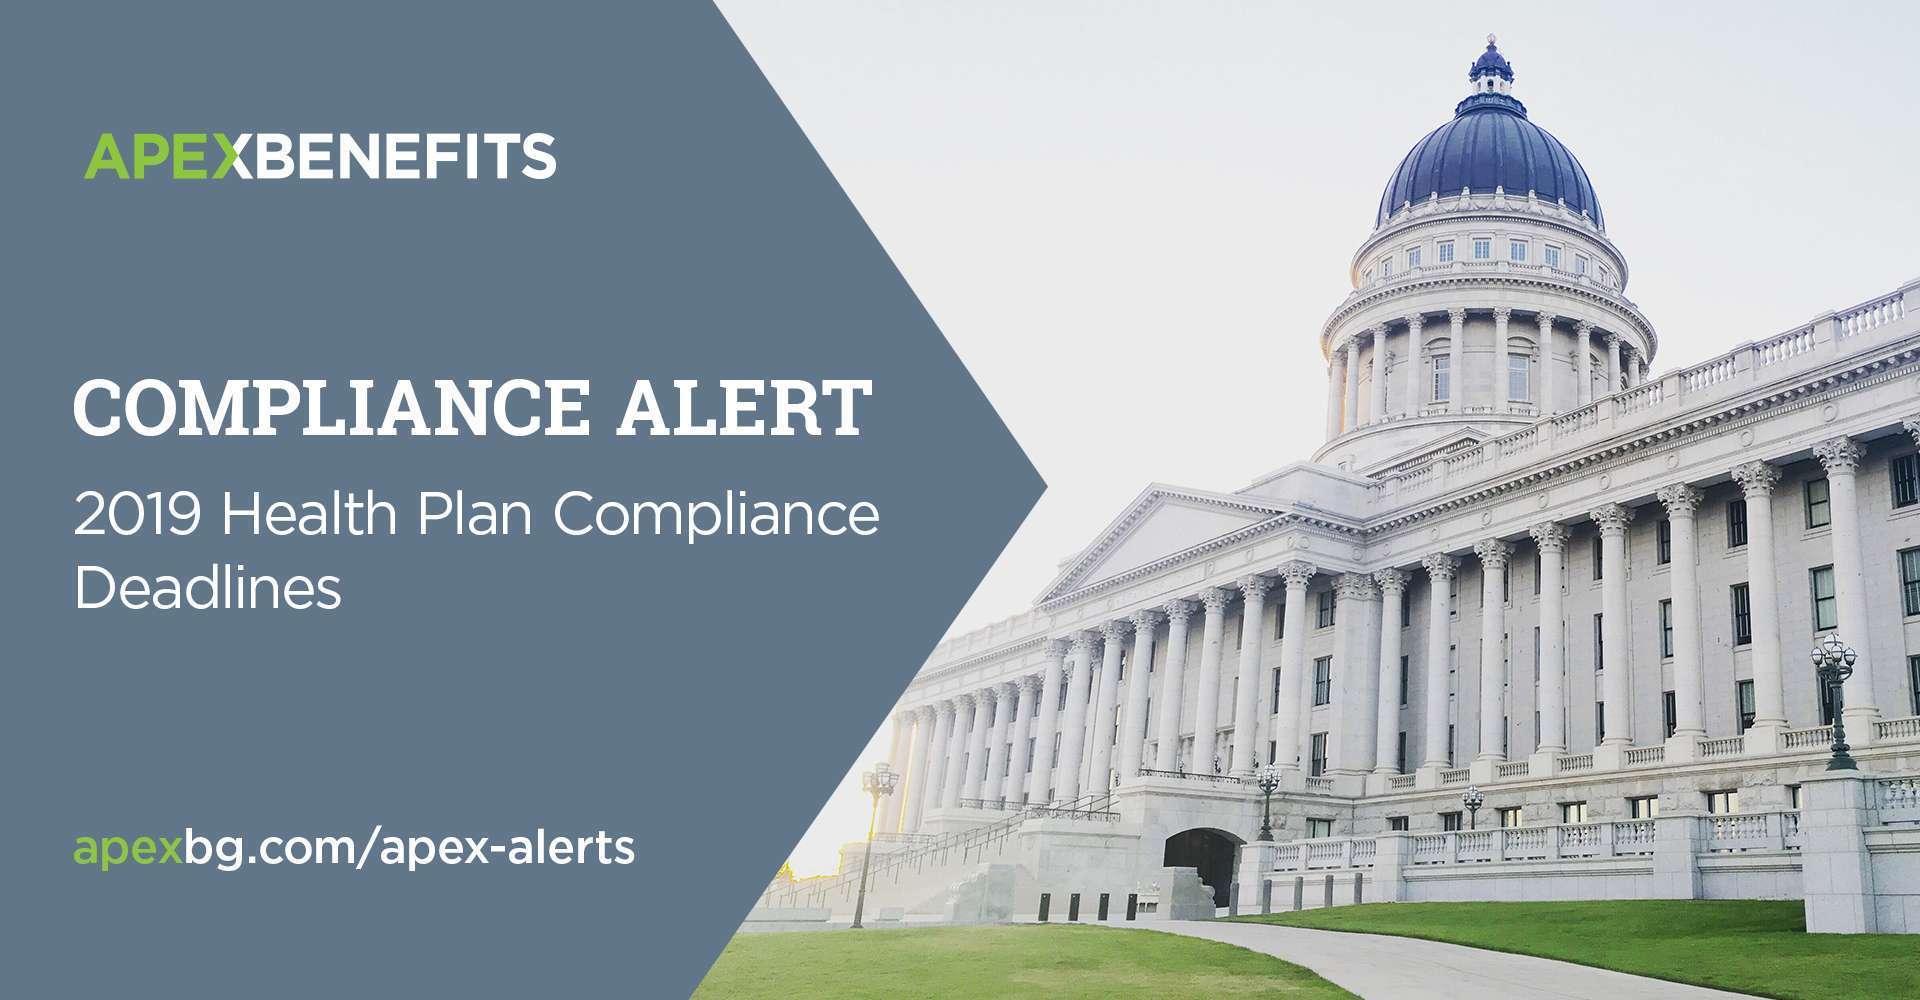 Compliance Alert: 2019 Health Plan Deadlines